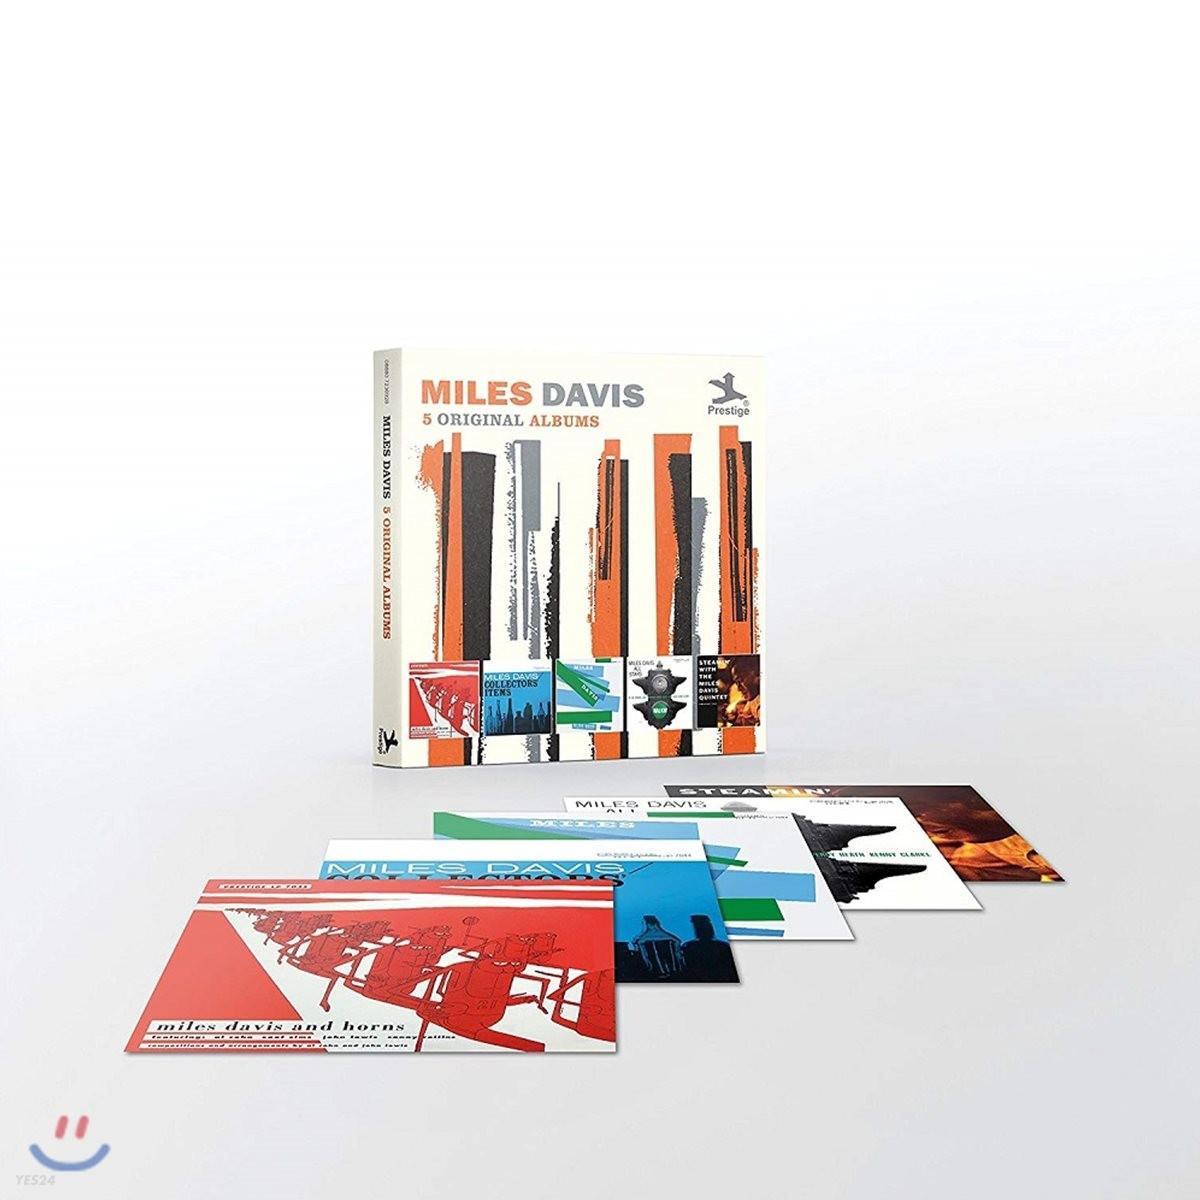 Miles Davis - 5 Original Albums [With Full Original Artwork] 마일즈 데이비스 오리지널 앨범 5CD 박스 세트